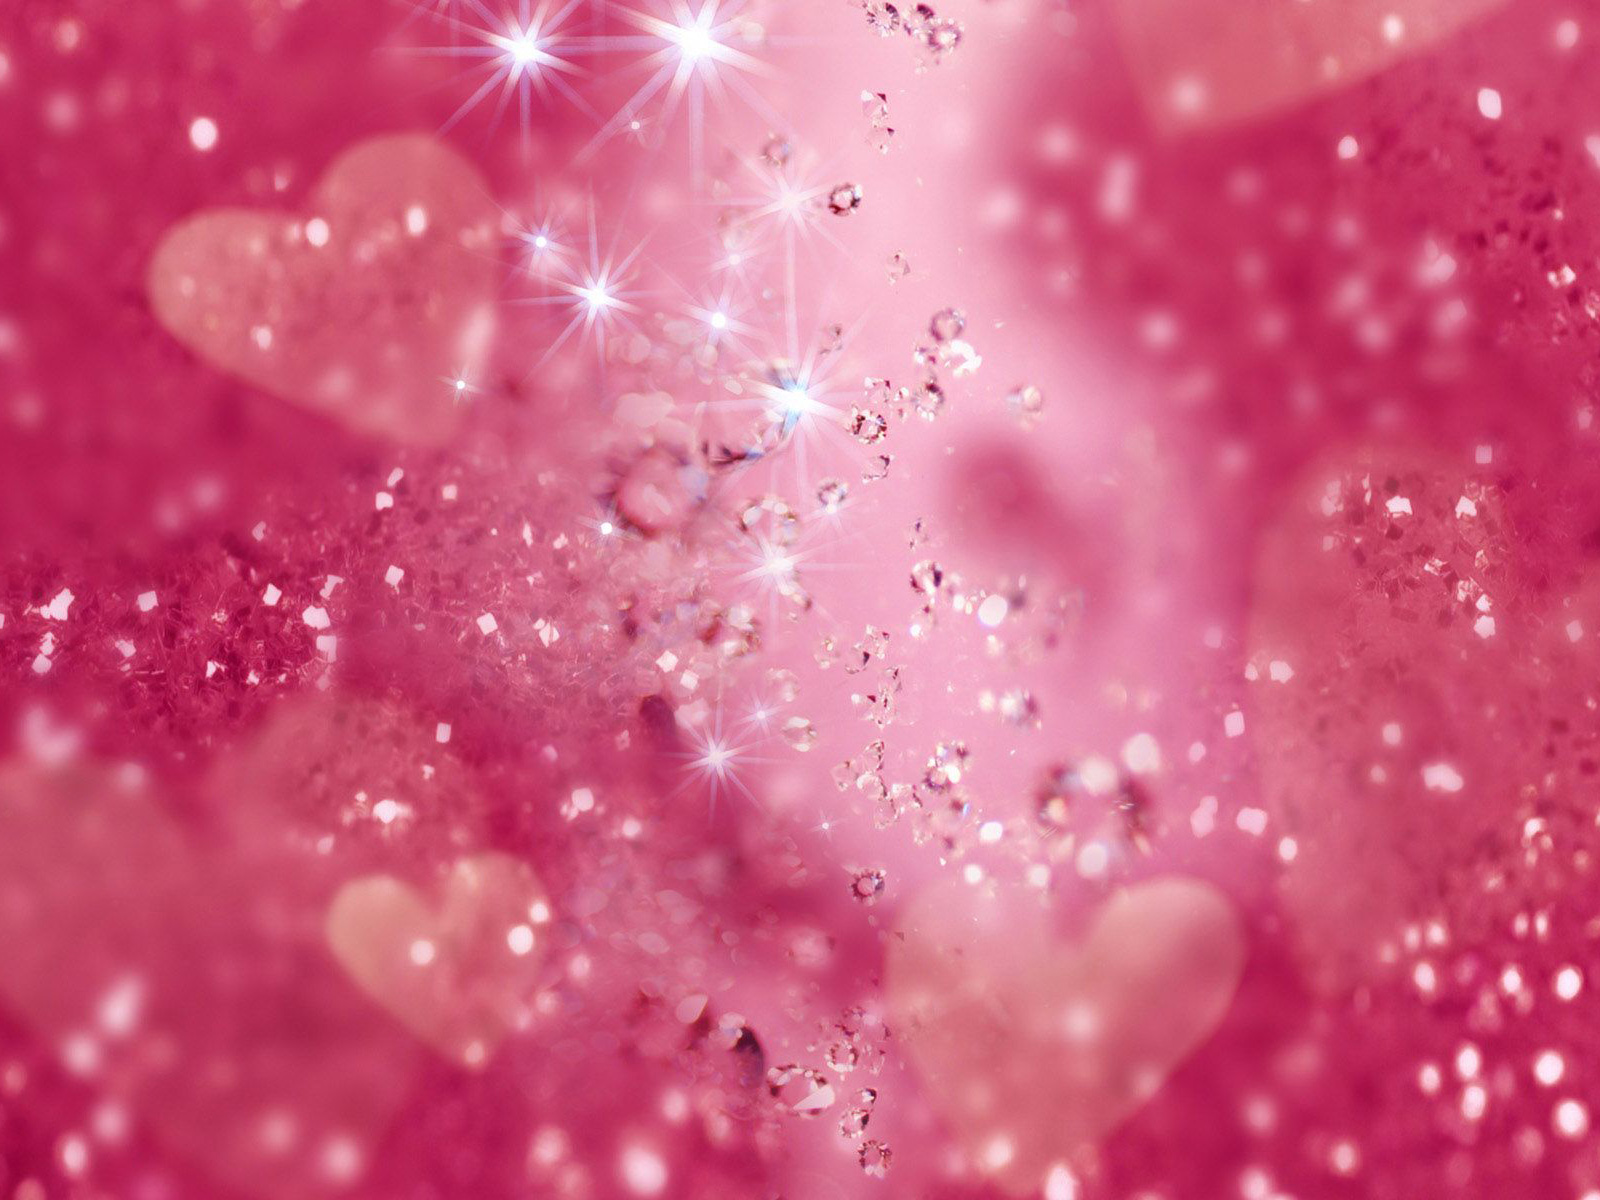 wallpaper love pink wallpapers cute pink wallpapers pink wallpapers 1600x1200